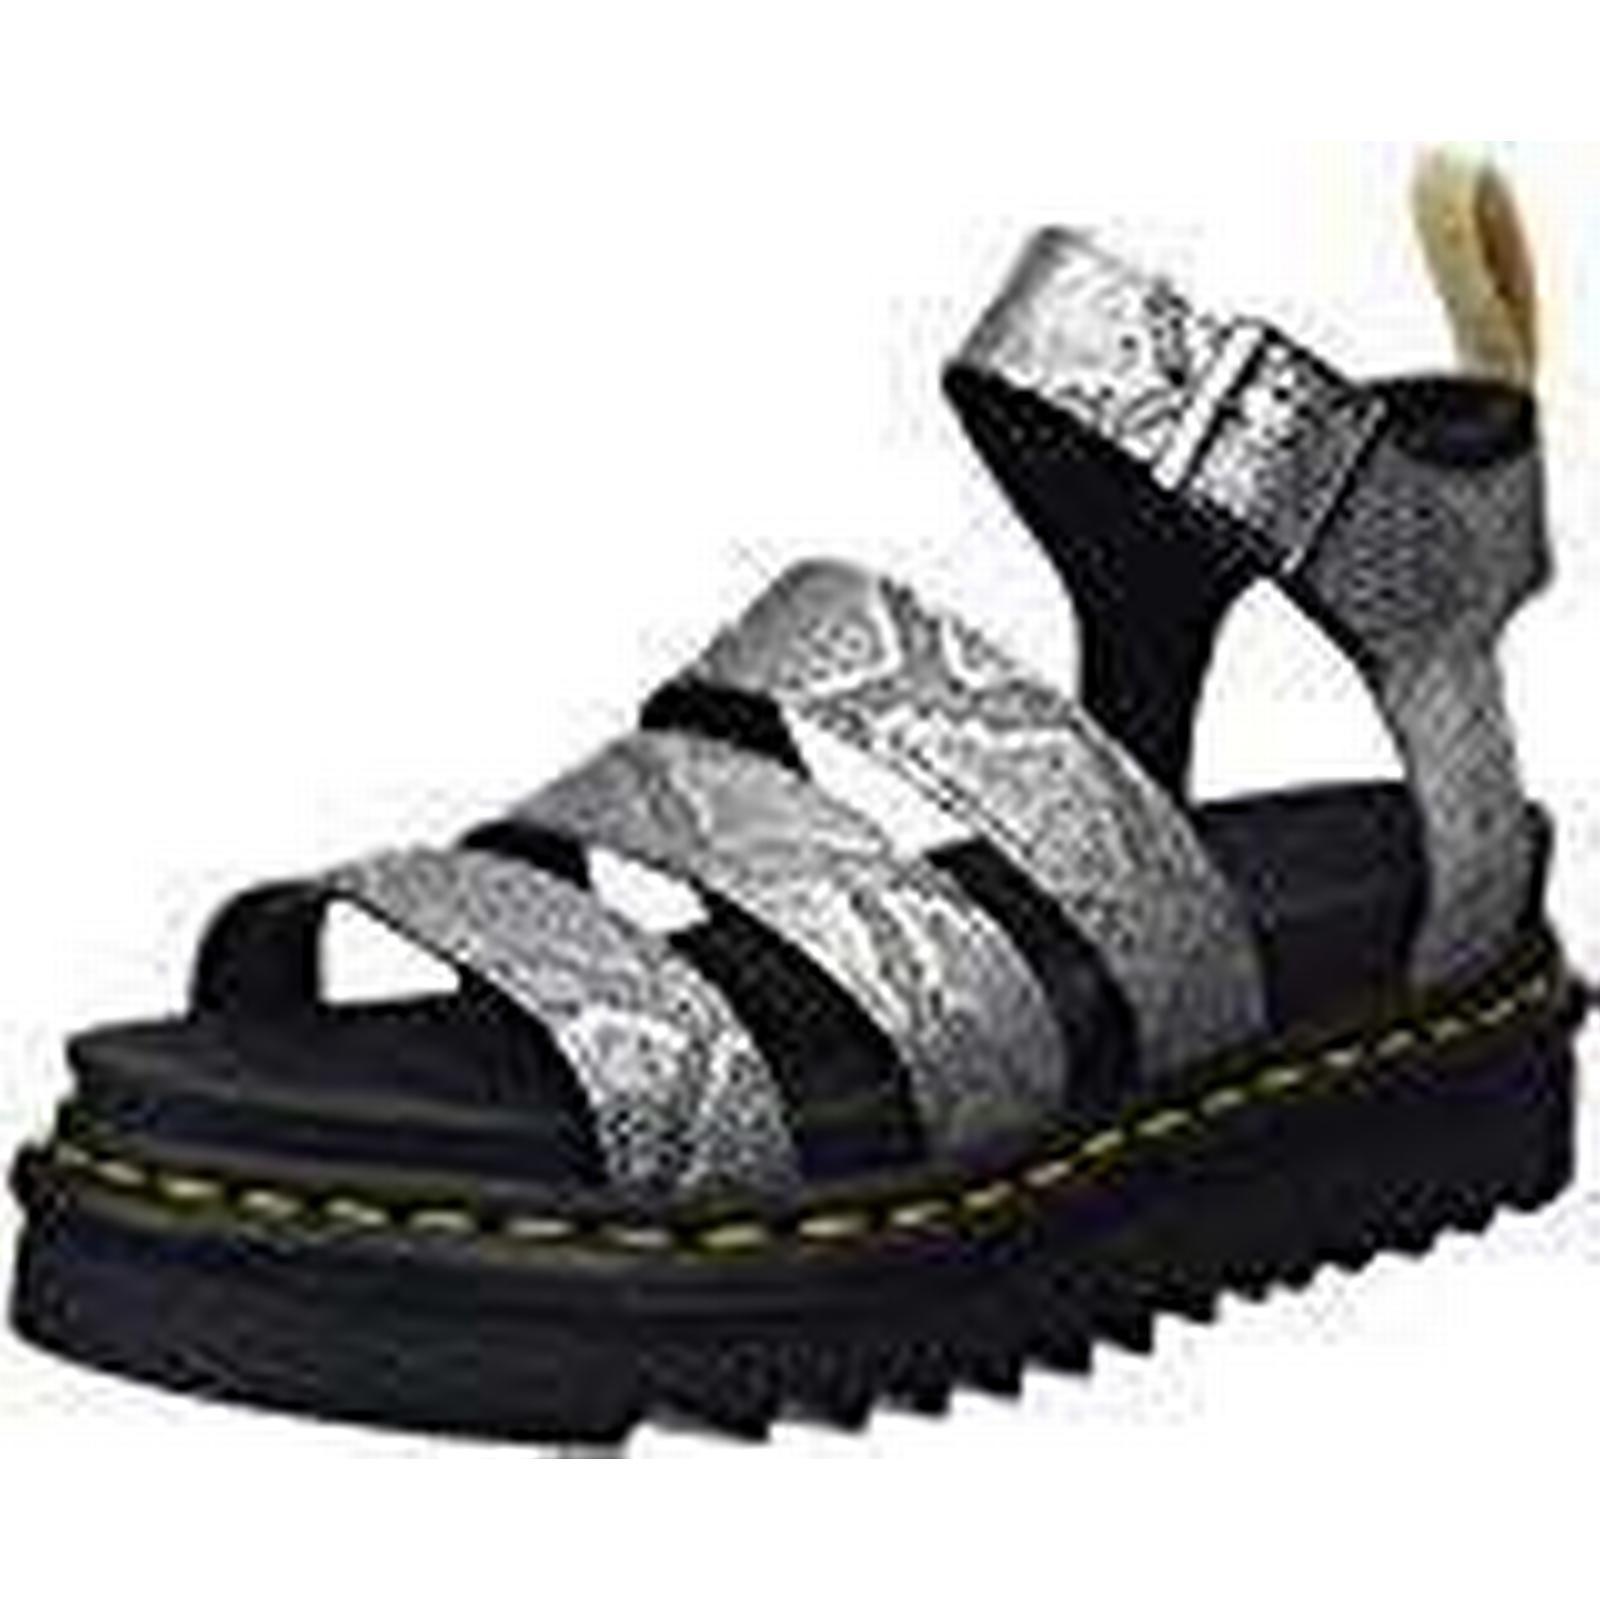 Dr. Martens Women's V (Silver/Black Blaire Open Toe Sandals, (Silver/Black V 040), 8 UK 42 EU a45da3